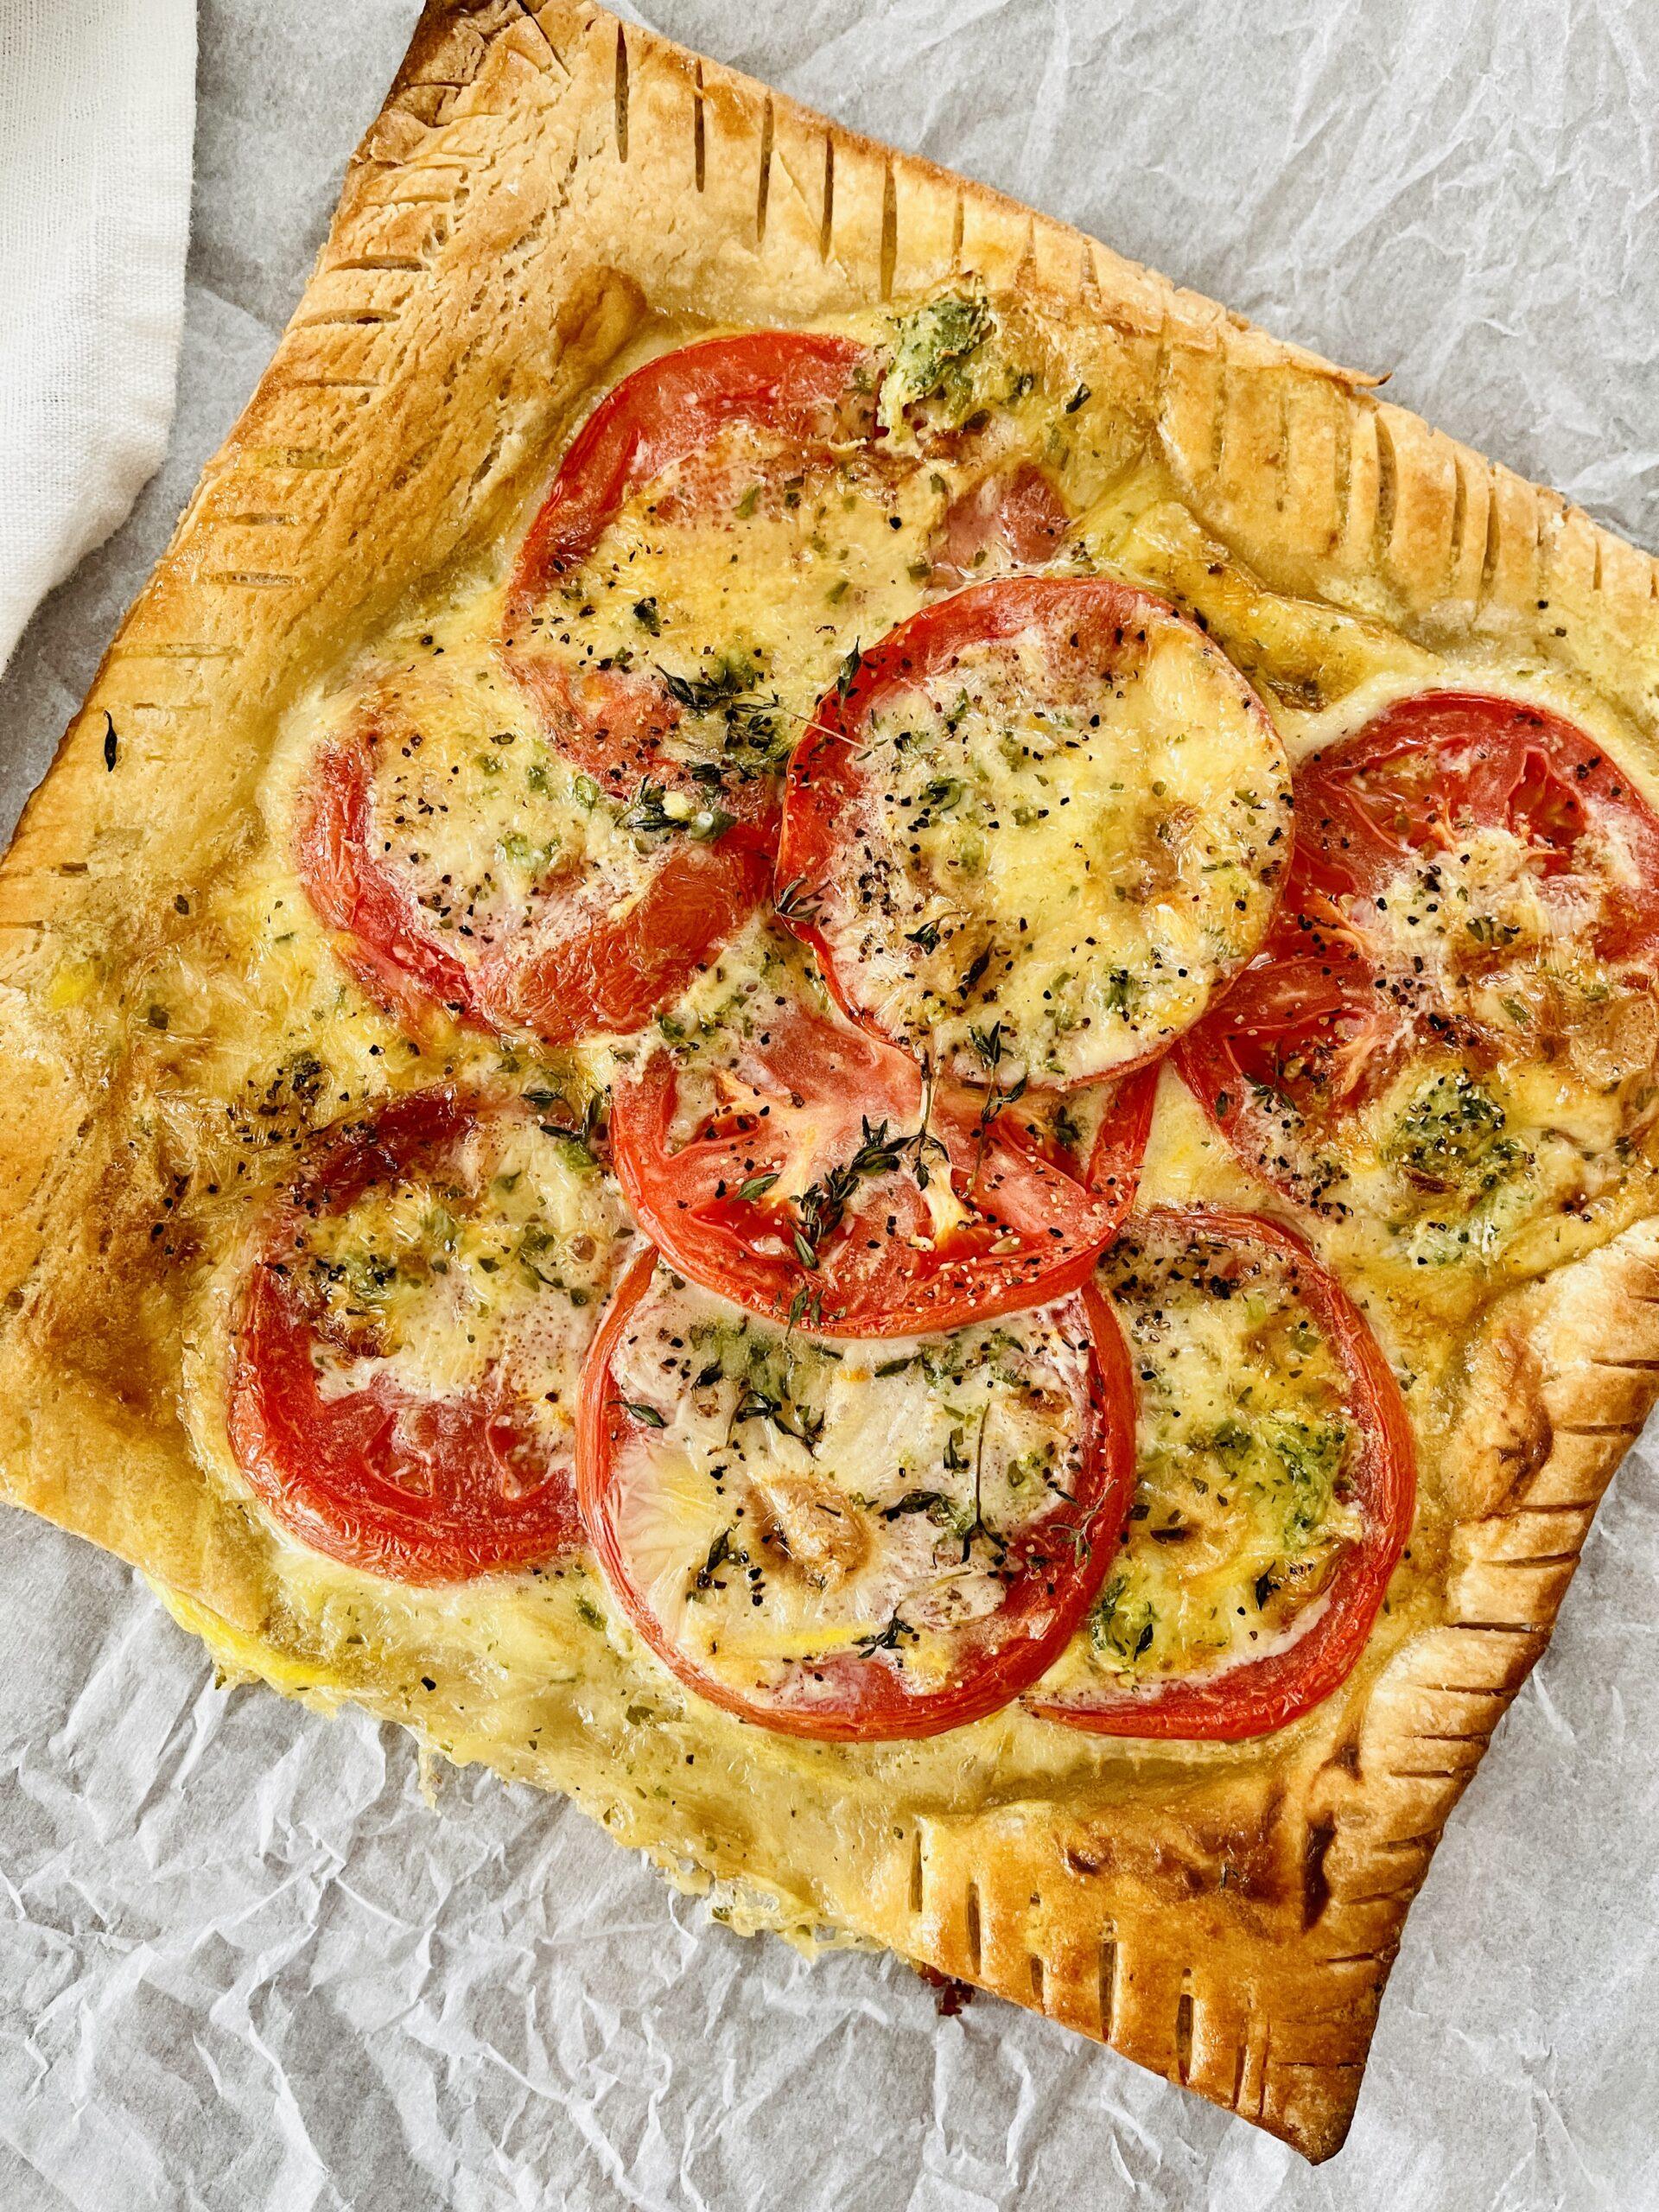 GF Tomato and Brie Tart